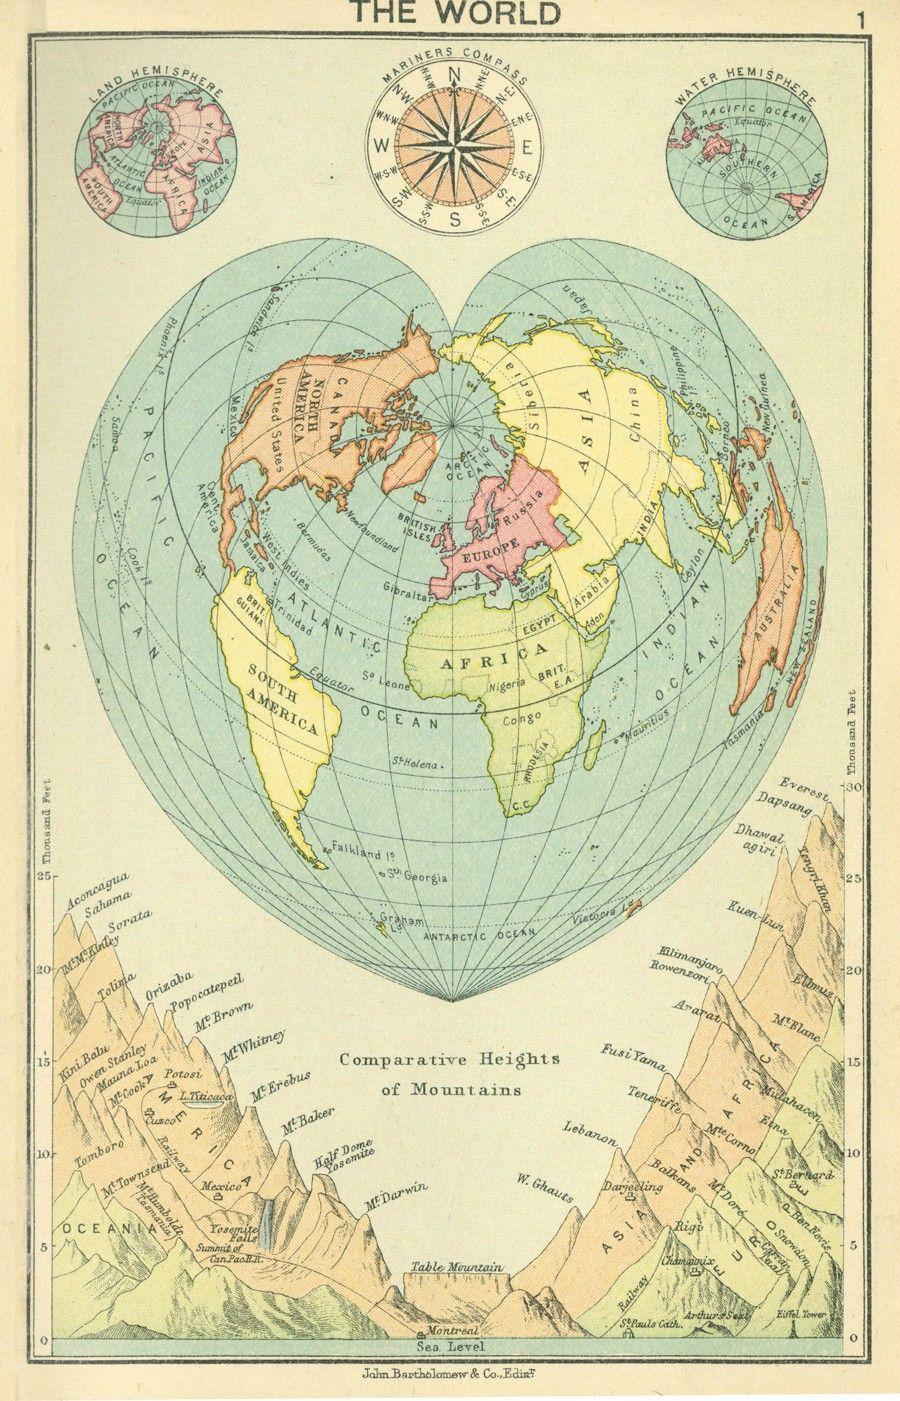 1913 j bartholomew world map heart shaped stabius werner 1913 j bartholomew world map heart shaped stabius werner projection 1125x1751 oc gumiabroncs Gallery